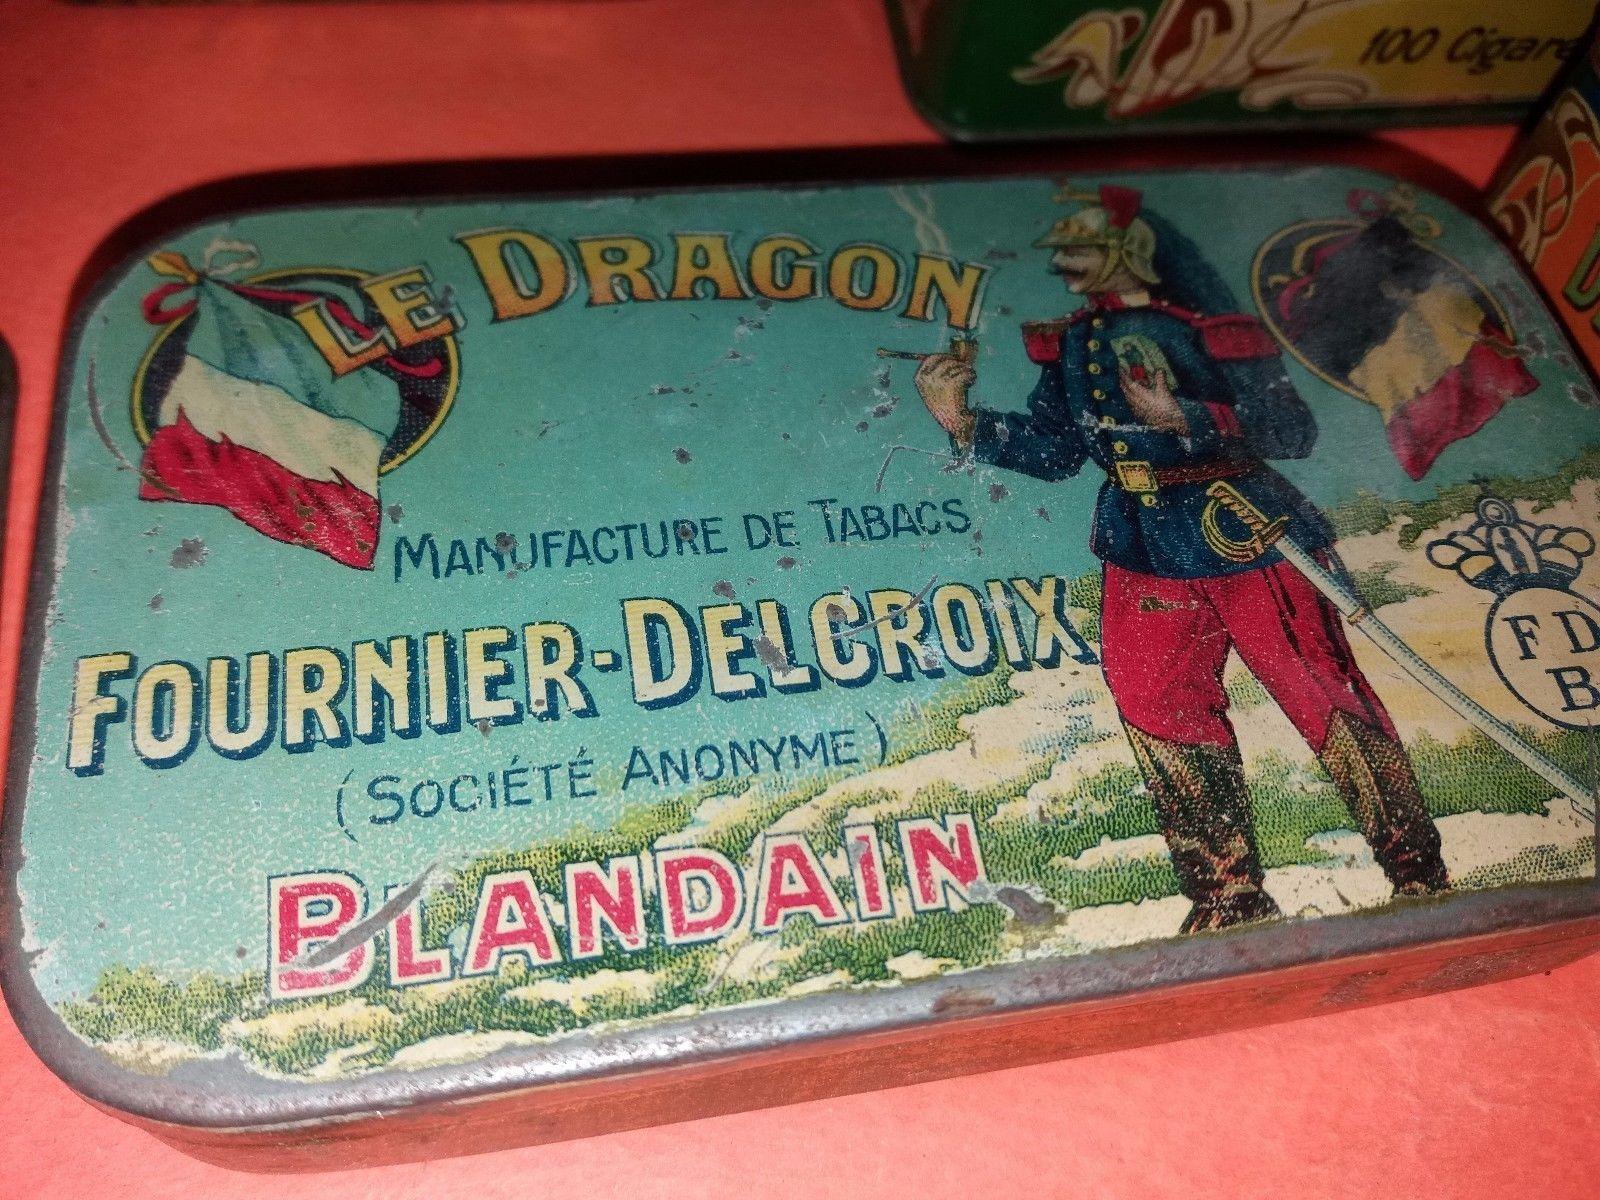 Details over Rare beautiful cigarette tin Le Dragon